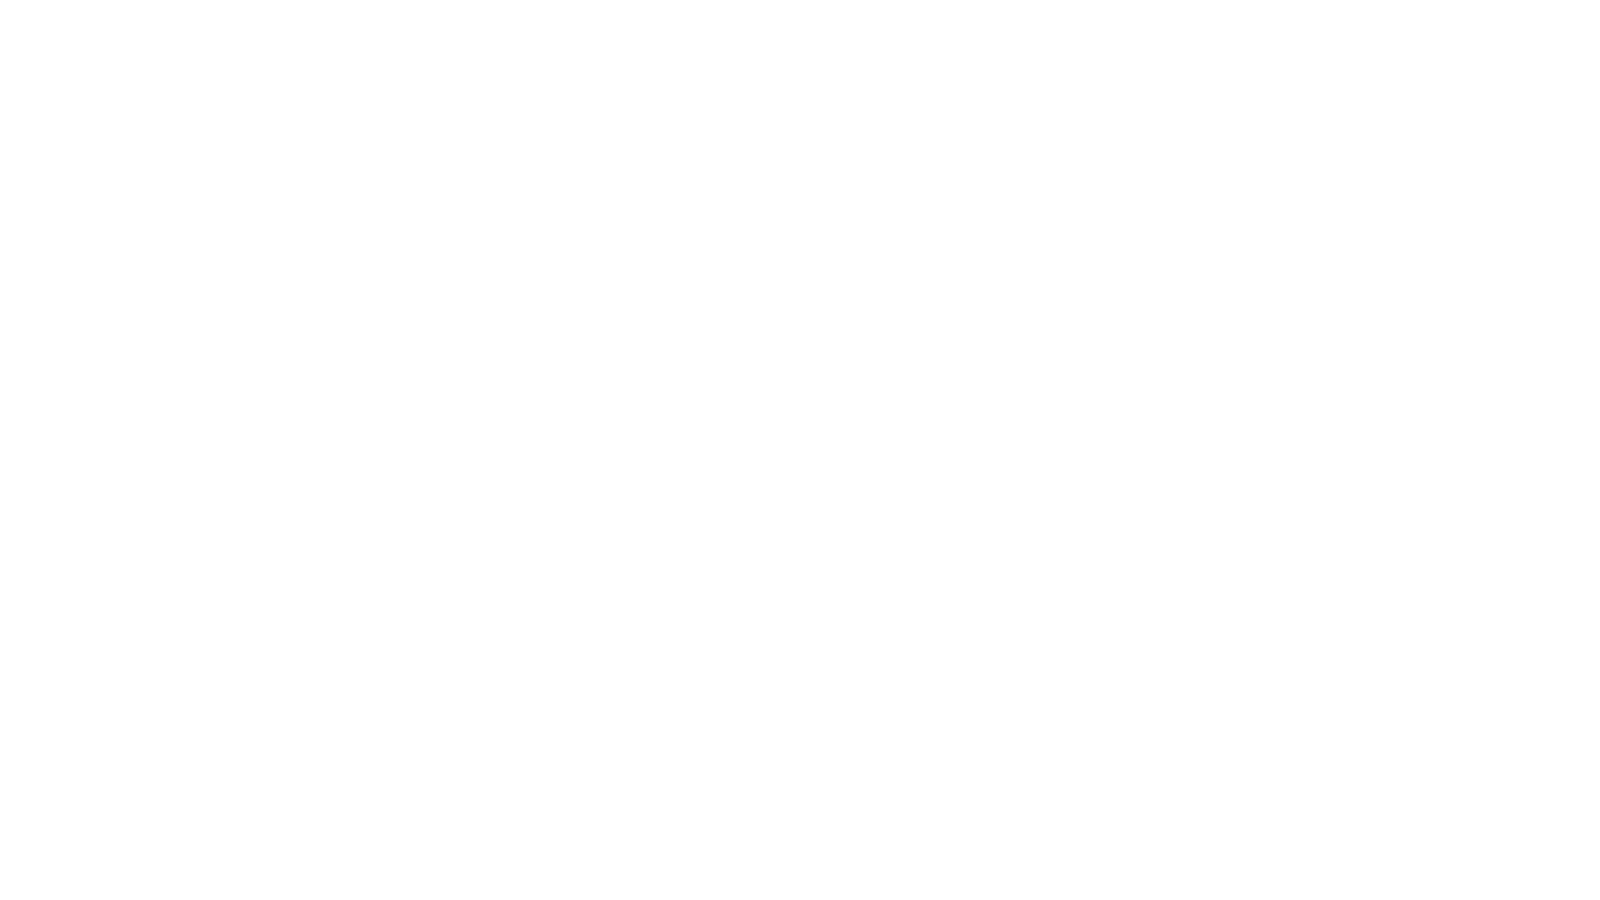 """The voice inside your head that says you can't do this is a liar."" - FITTrainer Kevin ▪▫▪▫▪▫▪▫▪▫ ⚡立刻預約試堂: Whatsapp: 66889191 ⚡上FITTPub網站瀏灠強勢FITT教練陣容: www.fittpub.com ⚡FITTPub分店地址: 白沙道FITTPub 📍香港銅鑼灣白沙道2號1-3樓 金朝陽FITTPub 📍香港銅鑼灣登龍街1-29號金朝陽中心二期Midtown28樓 ▪▫▪▫▪▫▪▫▪▫ #操身大勢 #白沙道2號 #金朝陽2期 #NeverStopFITTing"